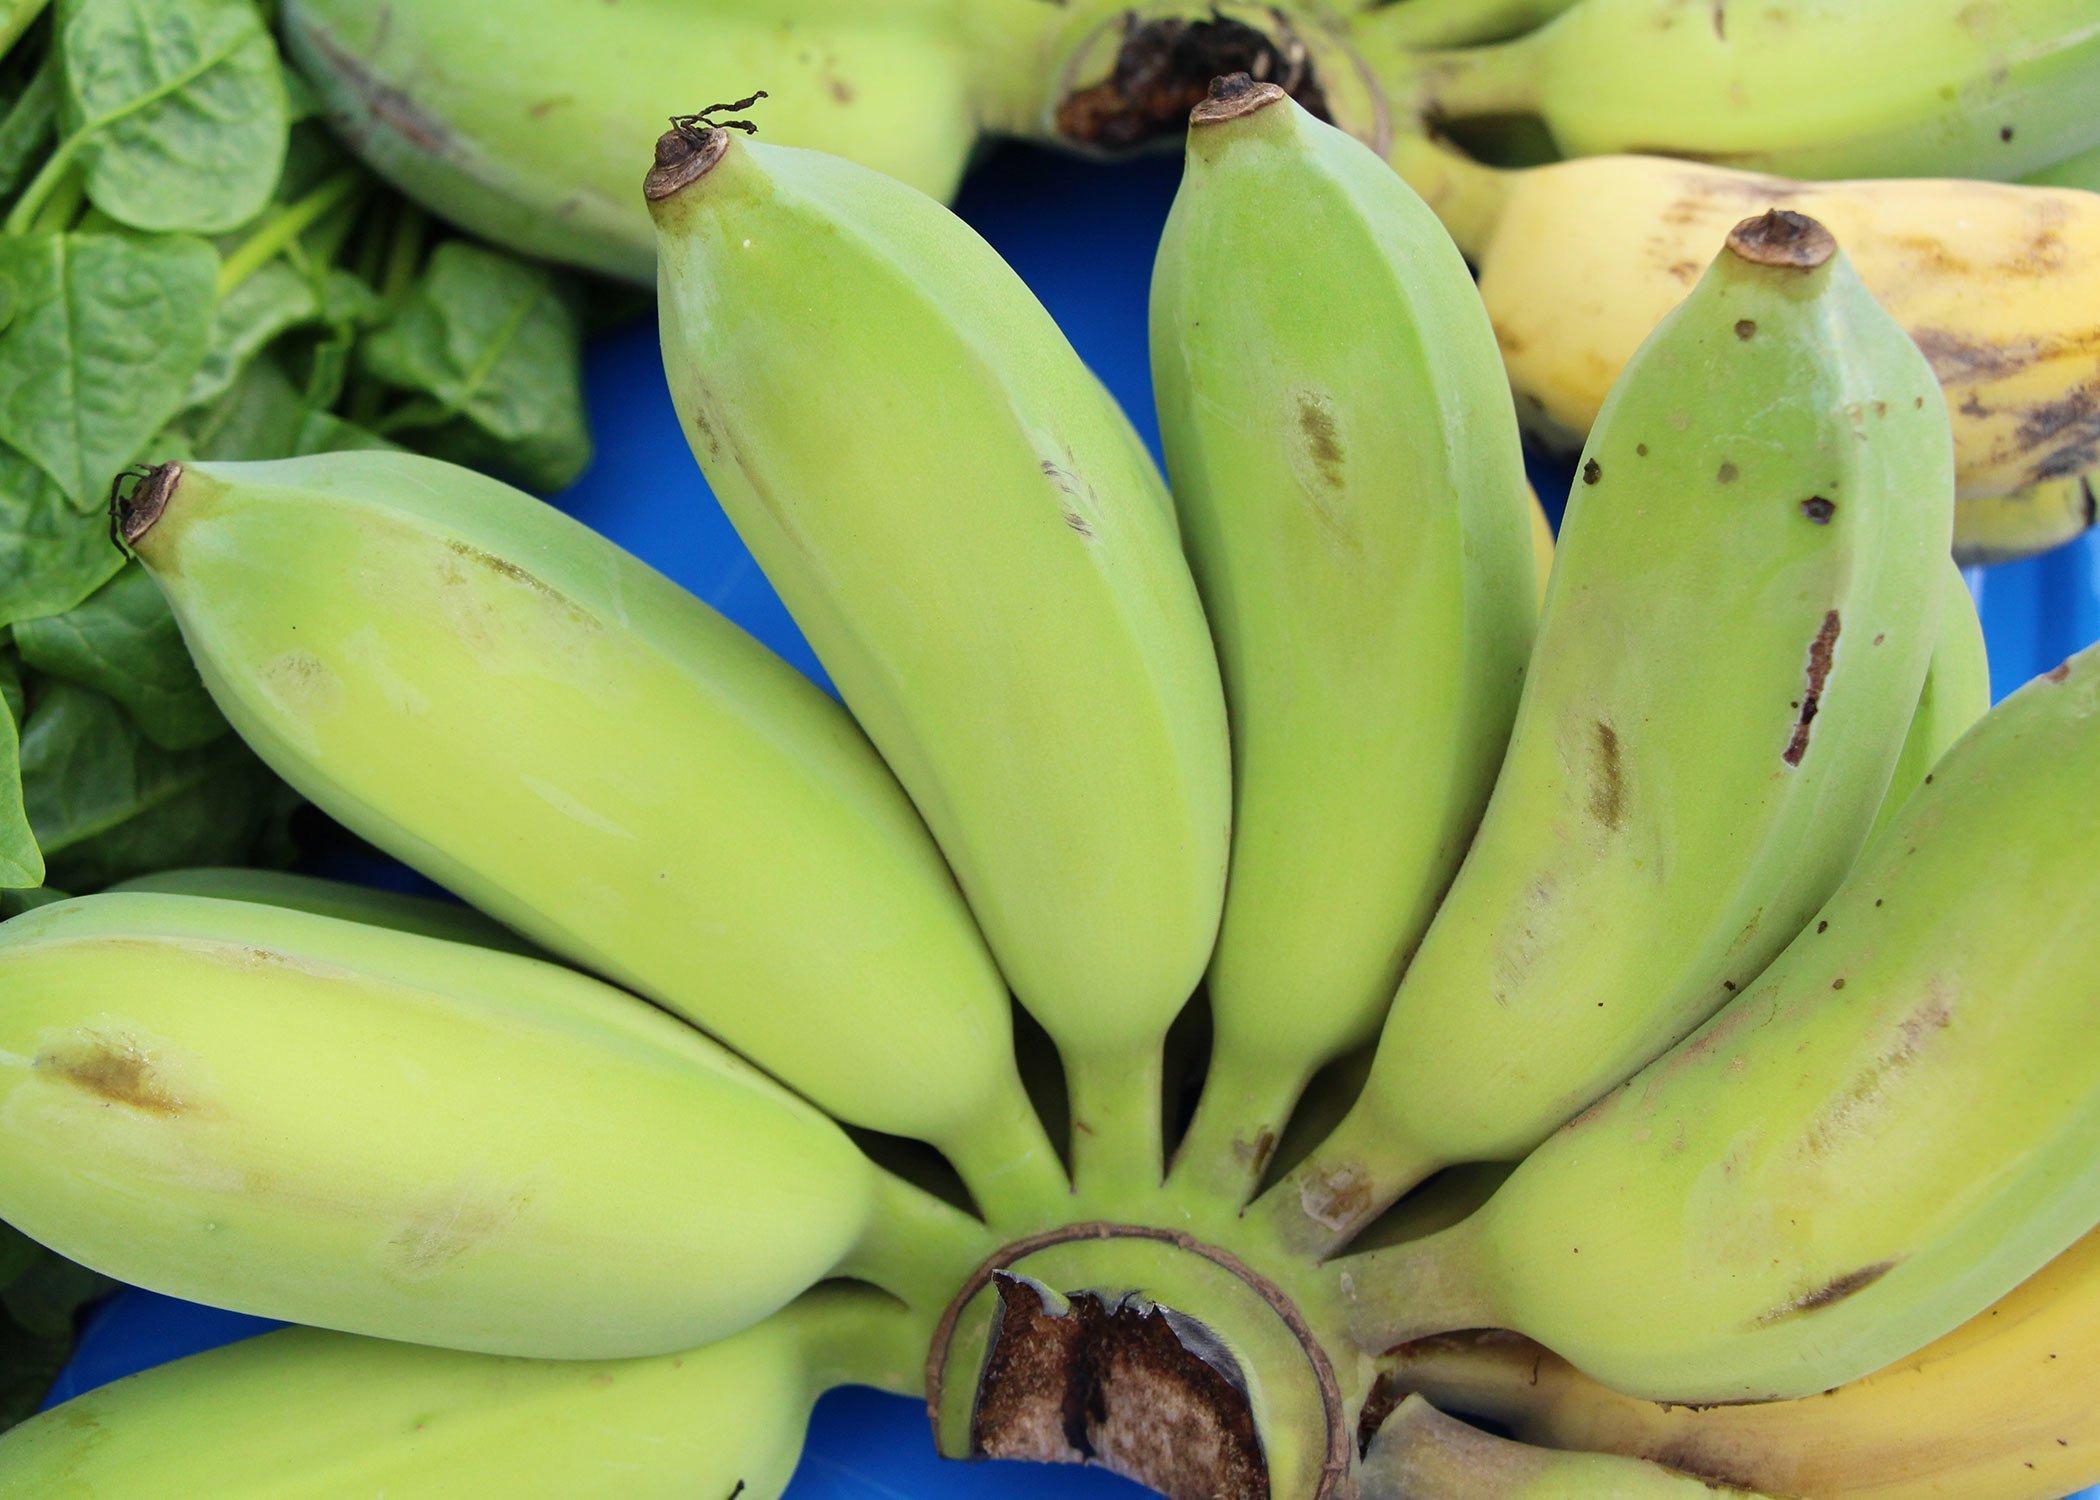 What are burro bananas?